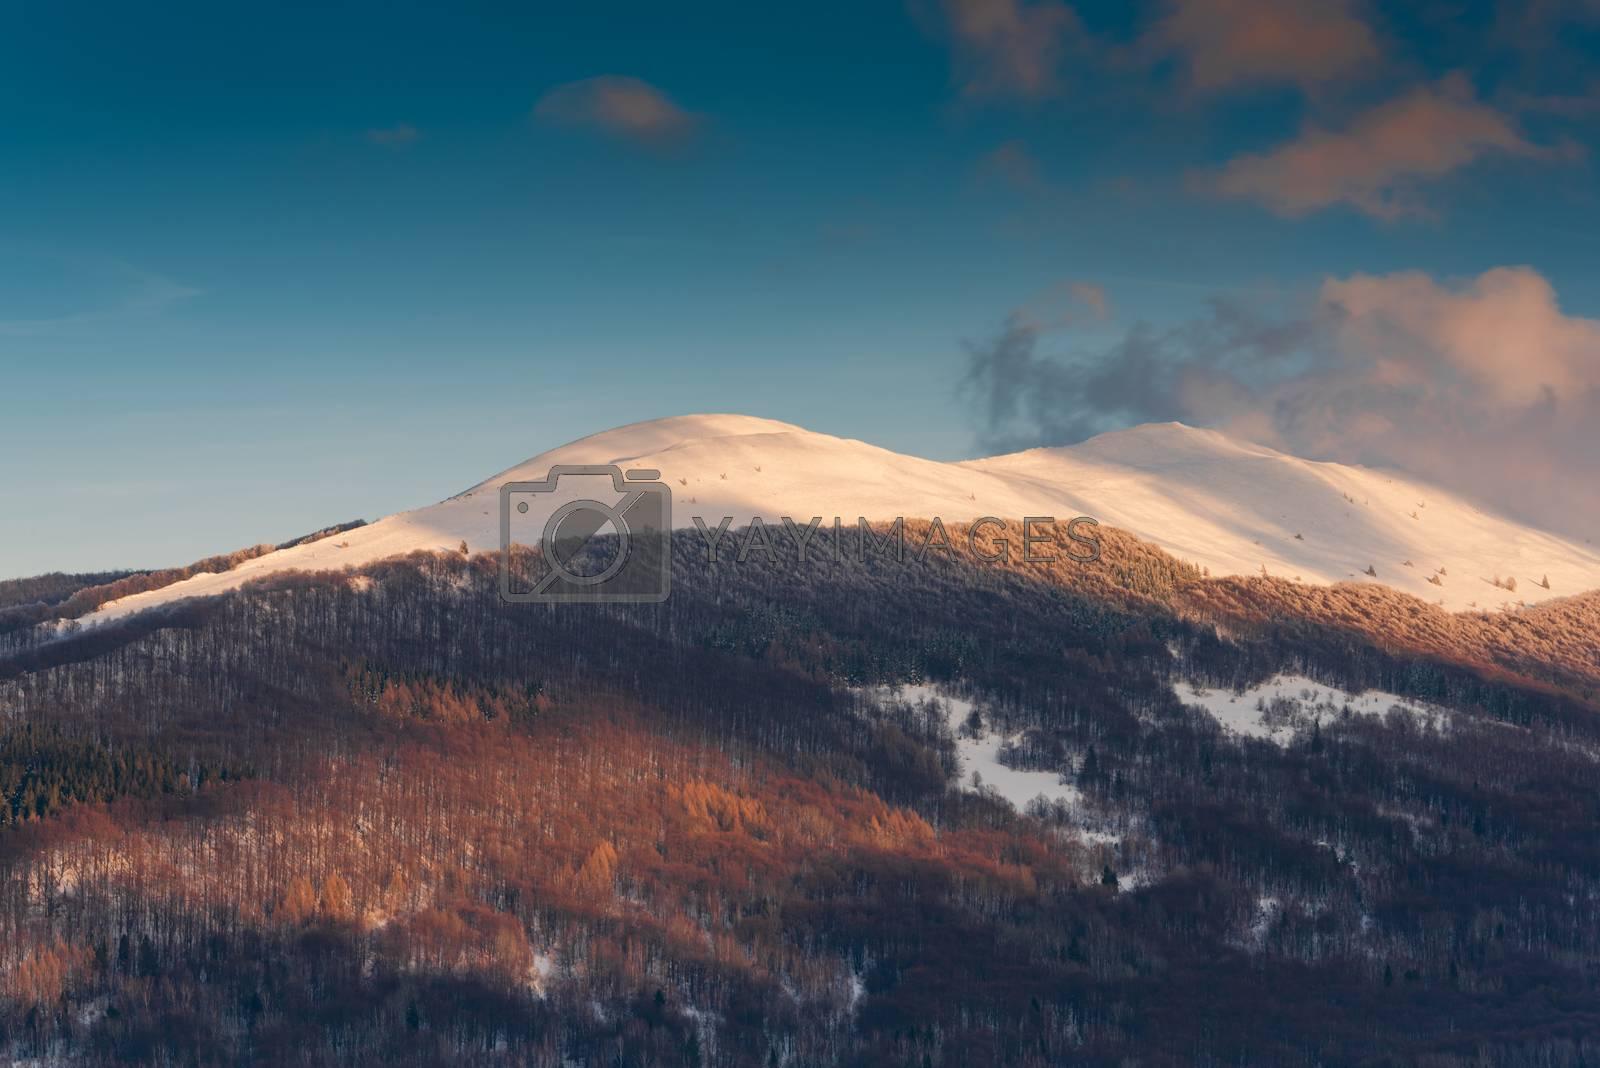 Polonyna Carynska and Wetlinska in Carpathian Mountains at Winte by merc67